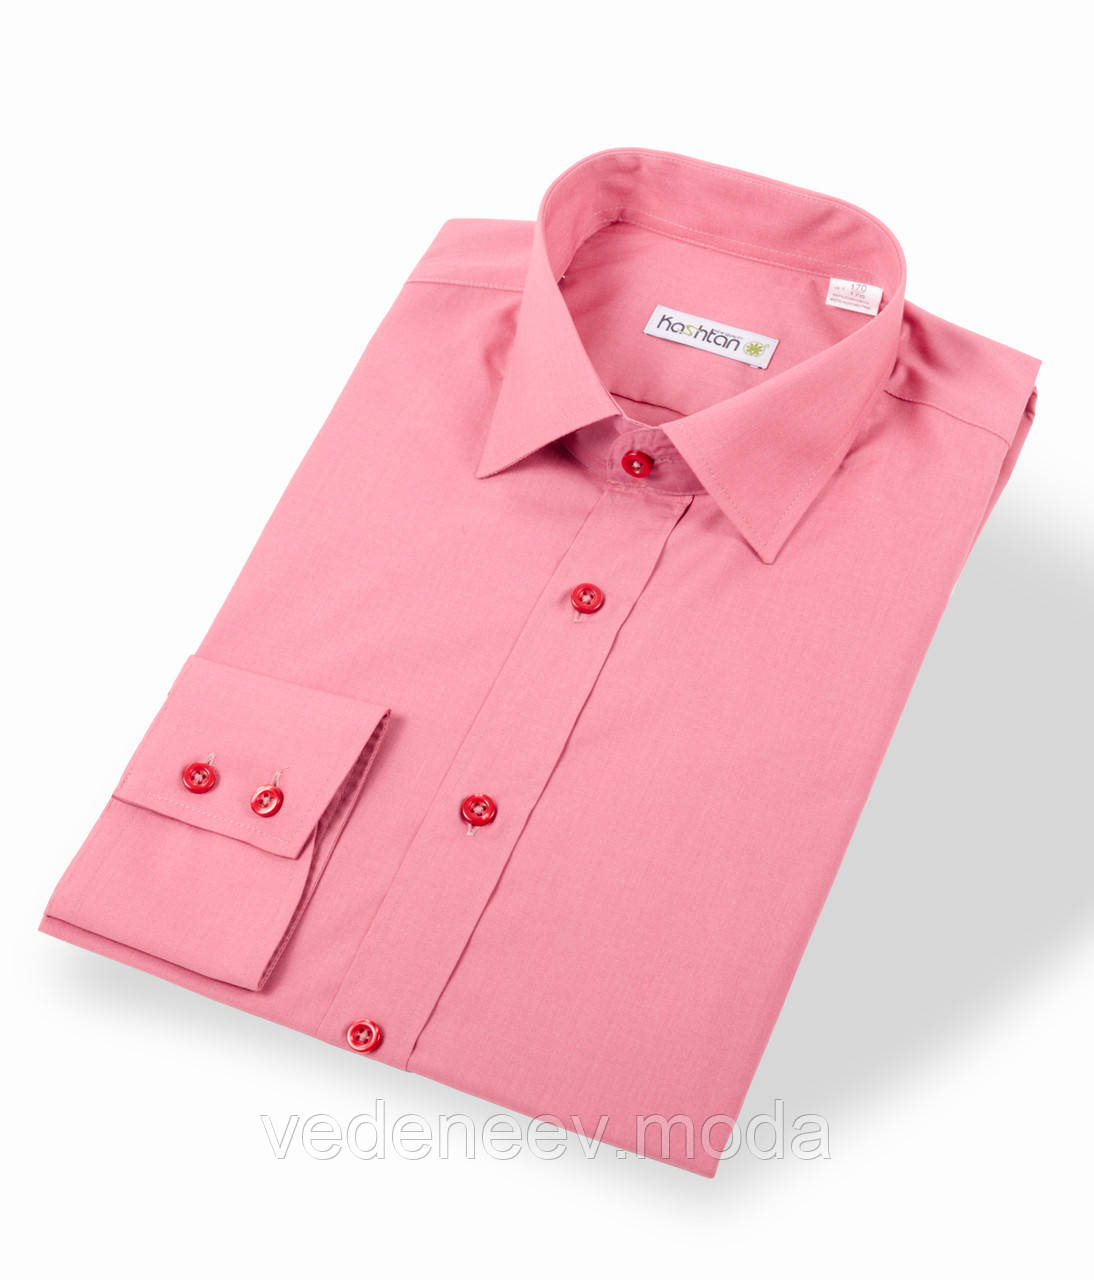 Темно-розовая рубашка